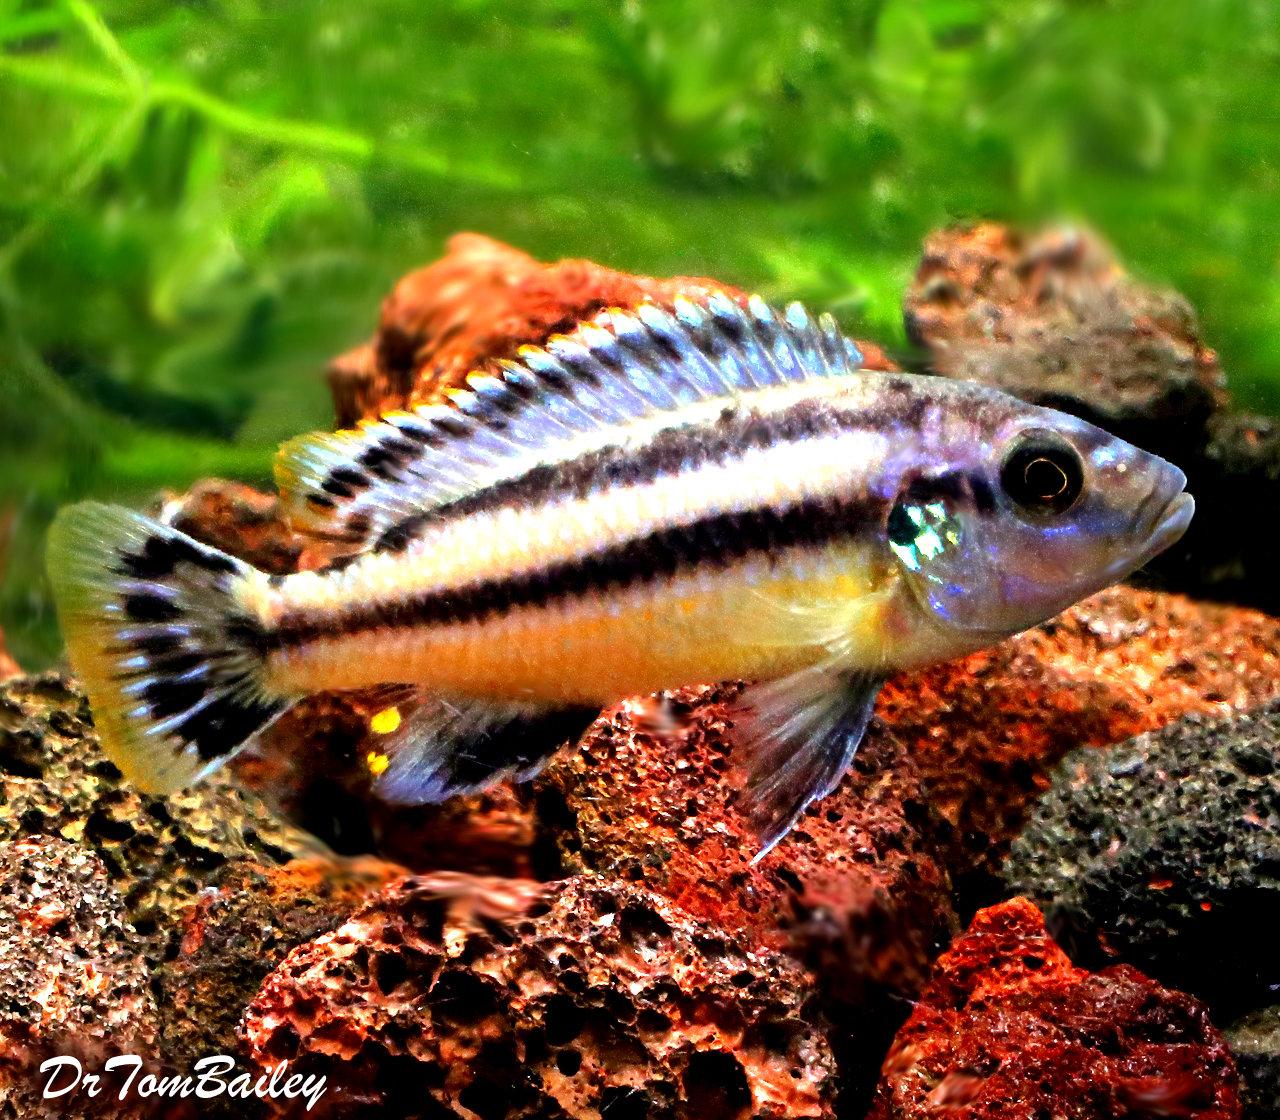 "Baby Lake Malawi Melanochromis Chipokae Mbuna Cichlid, 1"" to 1.2"" long."